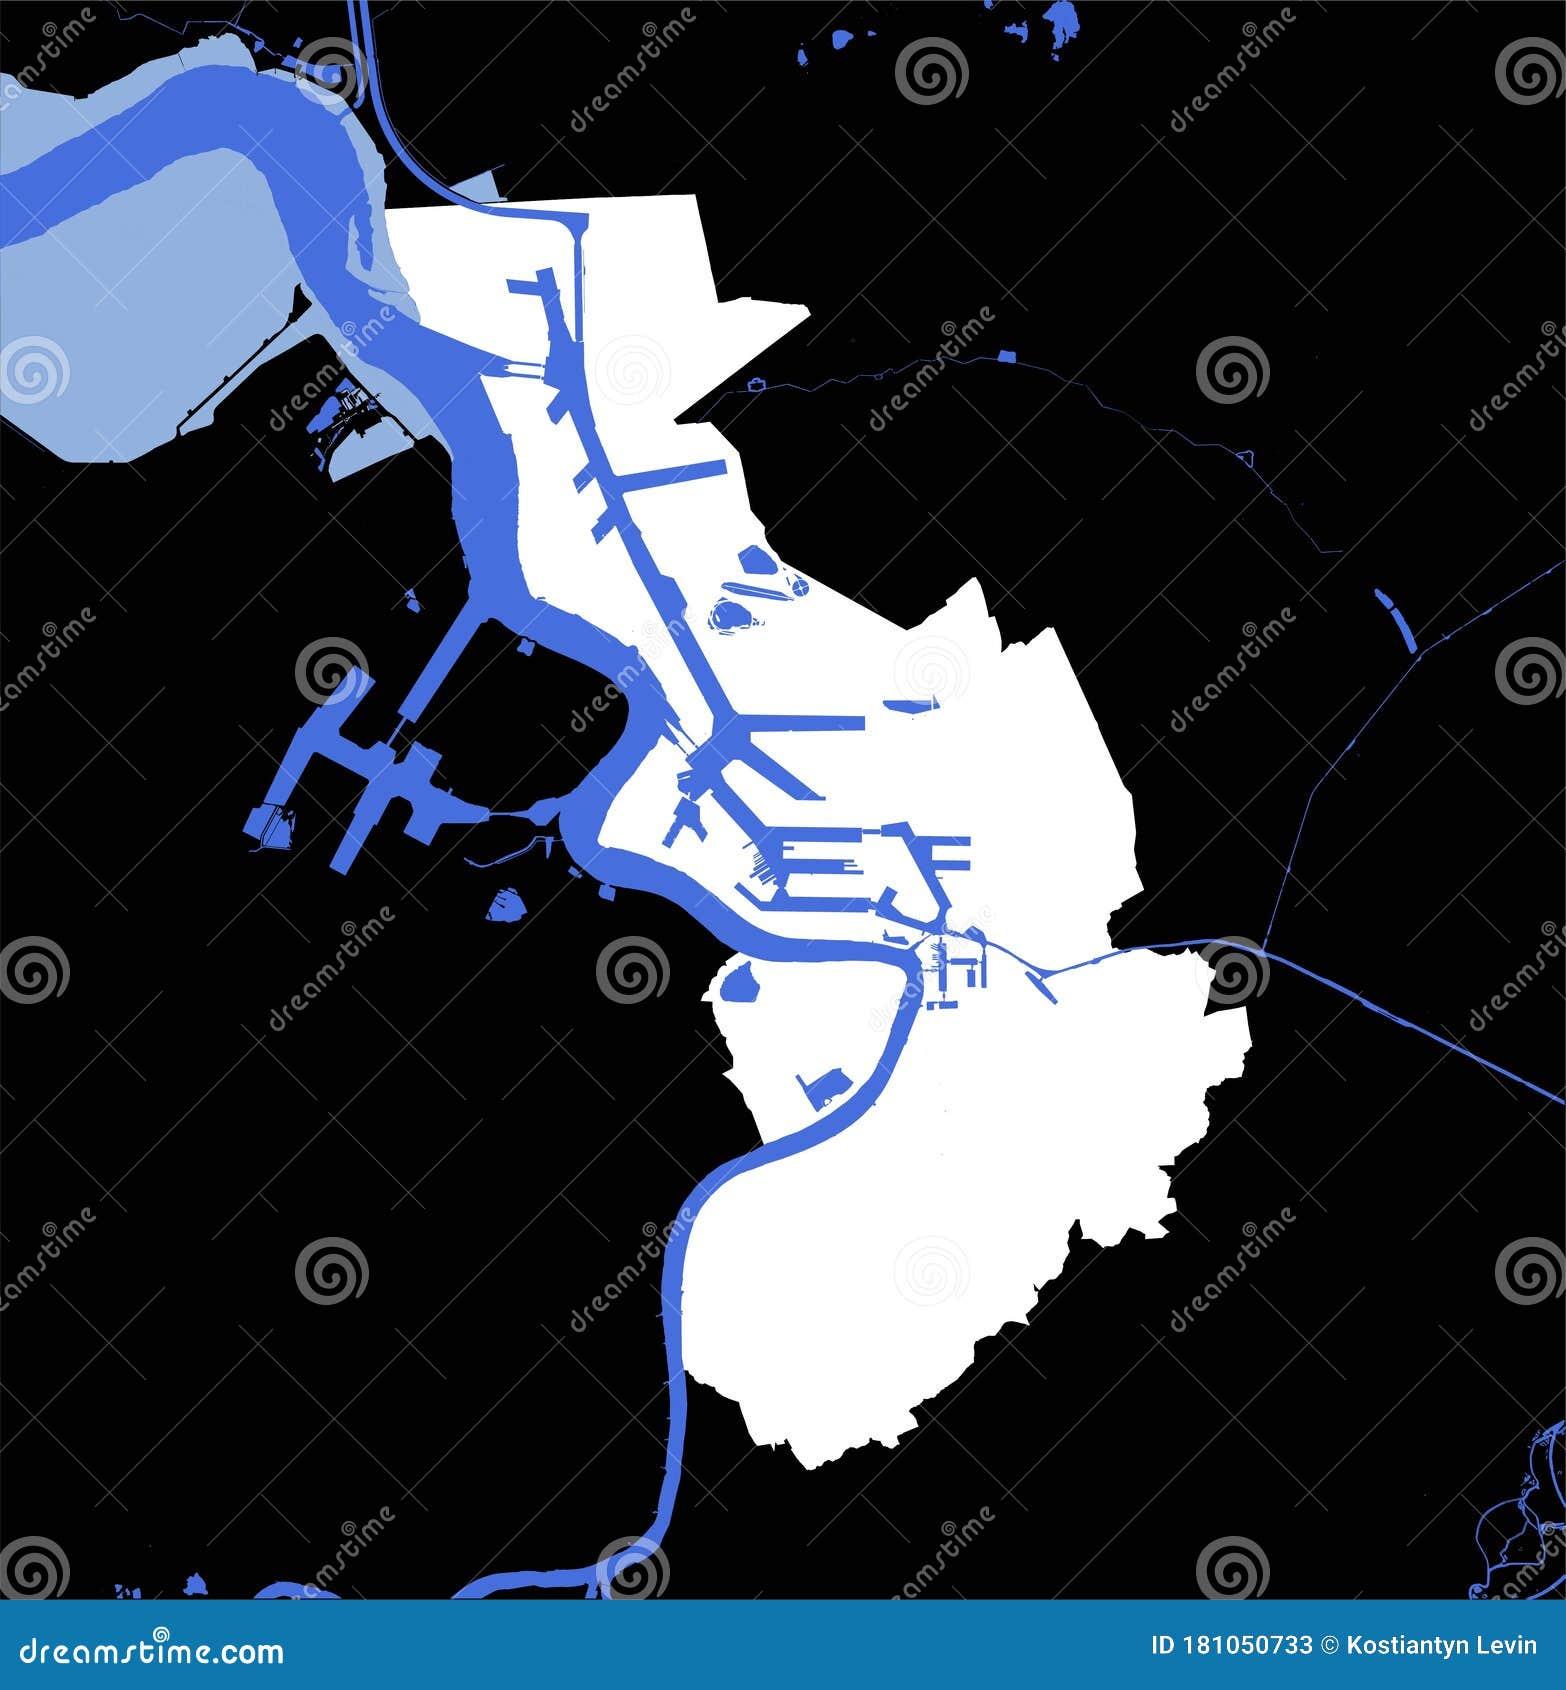 Vector Map Of Antwerpen Antwerp Belgium With River And Coastline Stock Illustration Illustration Of River Area 181050733